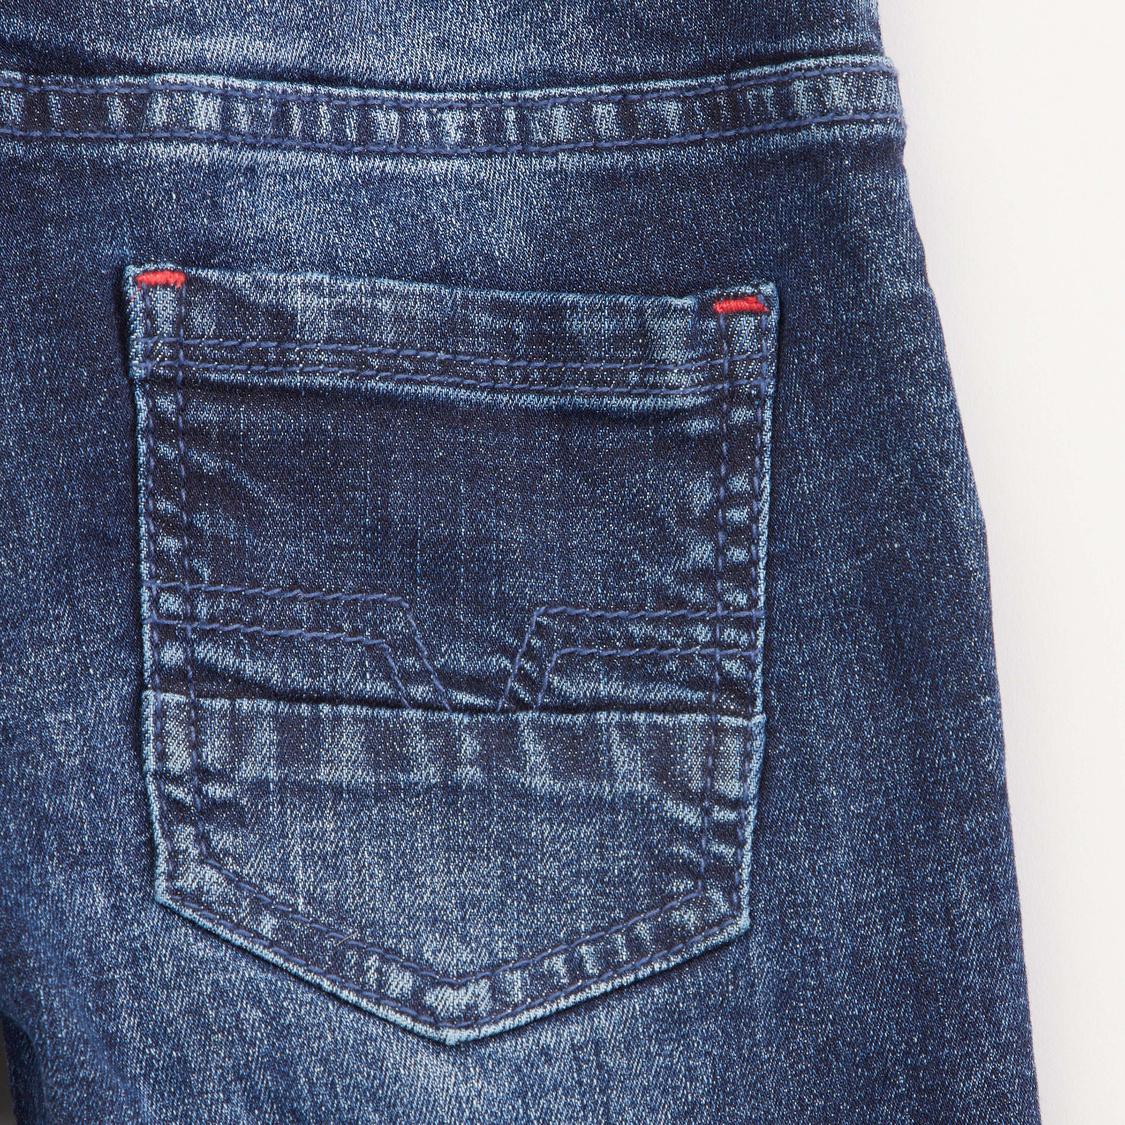 Pocket Detail Jeggings with Drawstring